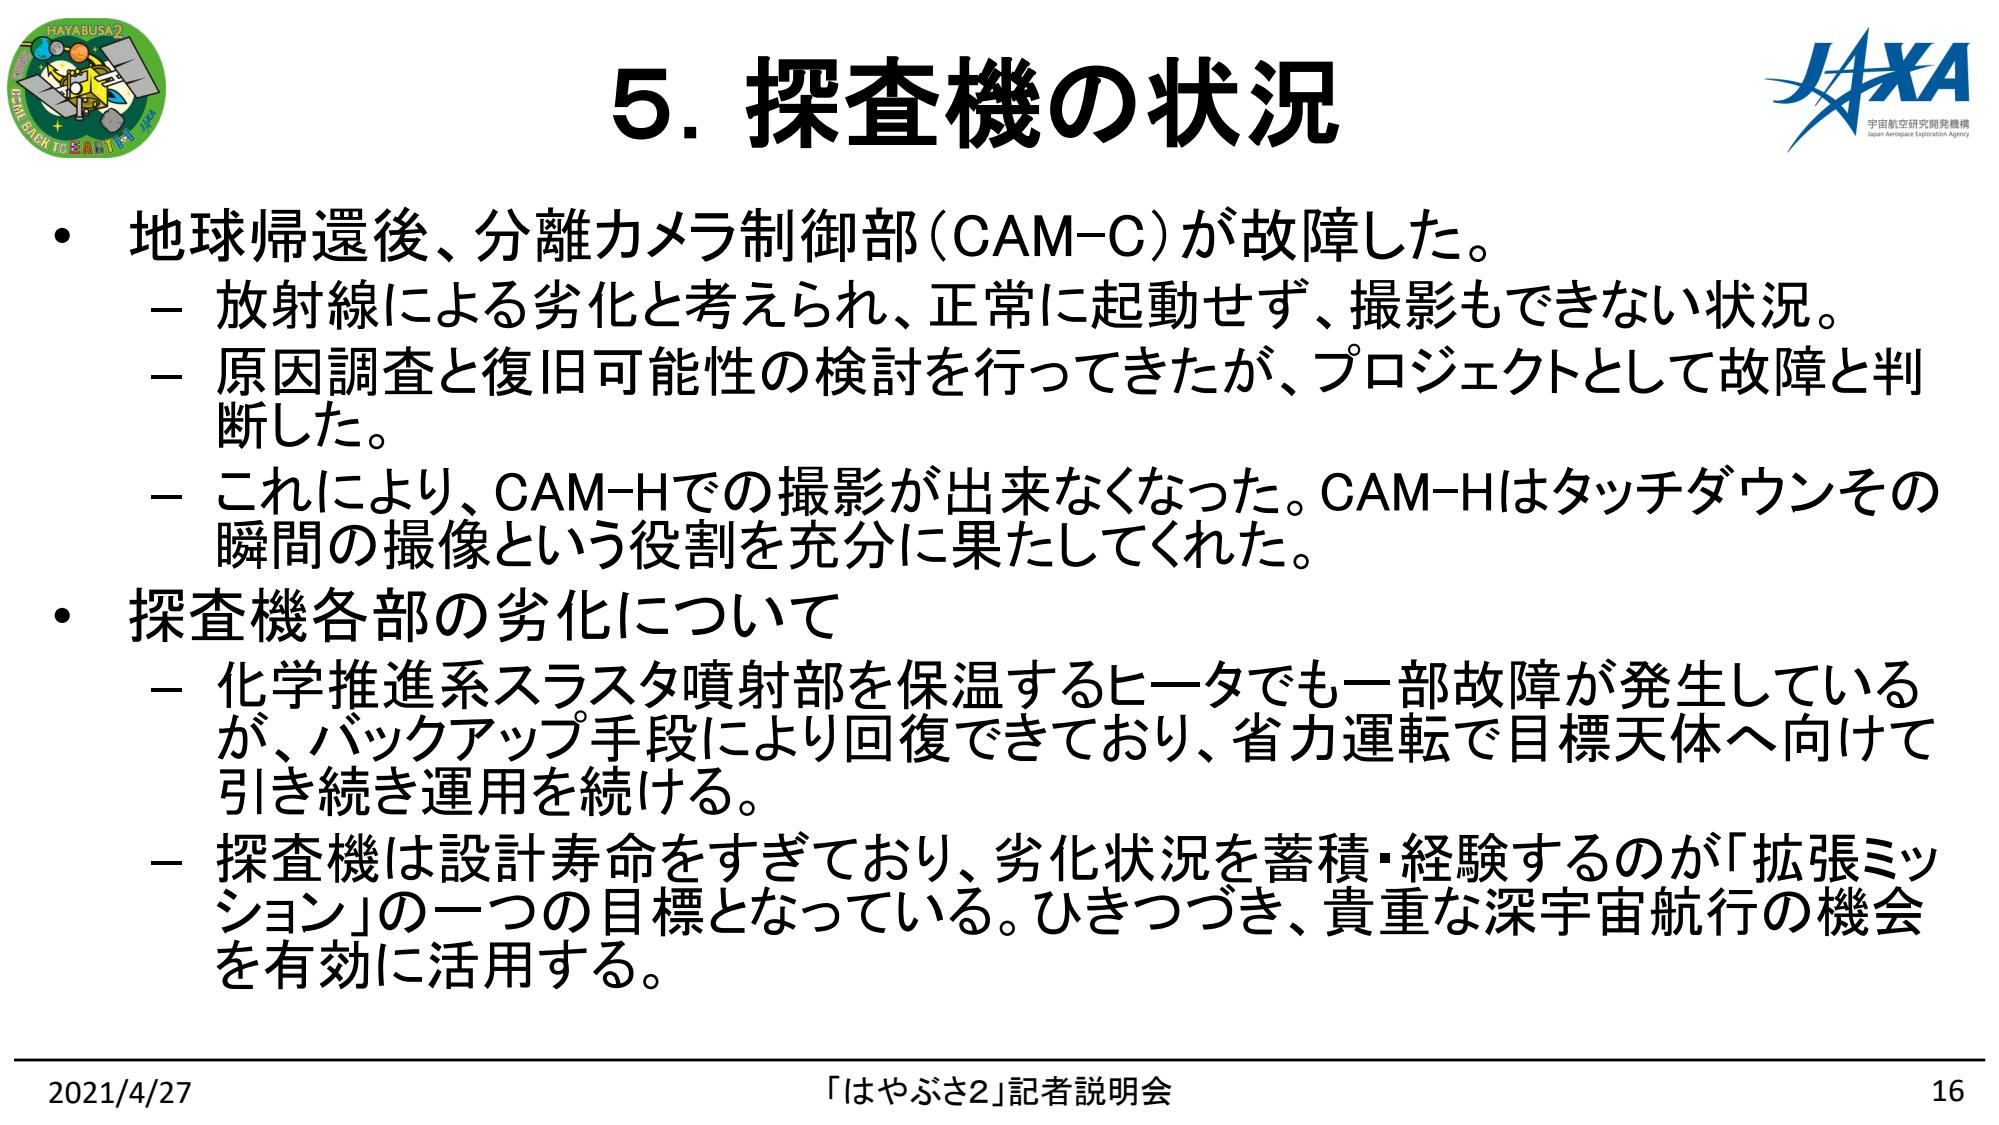 f:id:Imamura:20210427135234p:plain